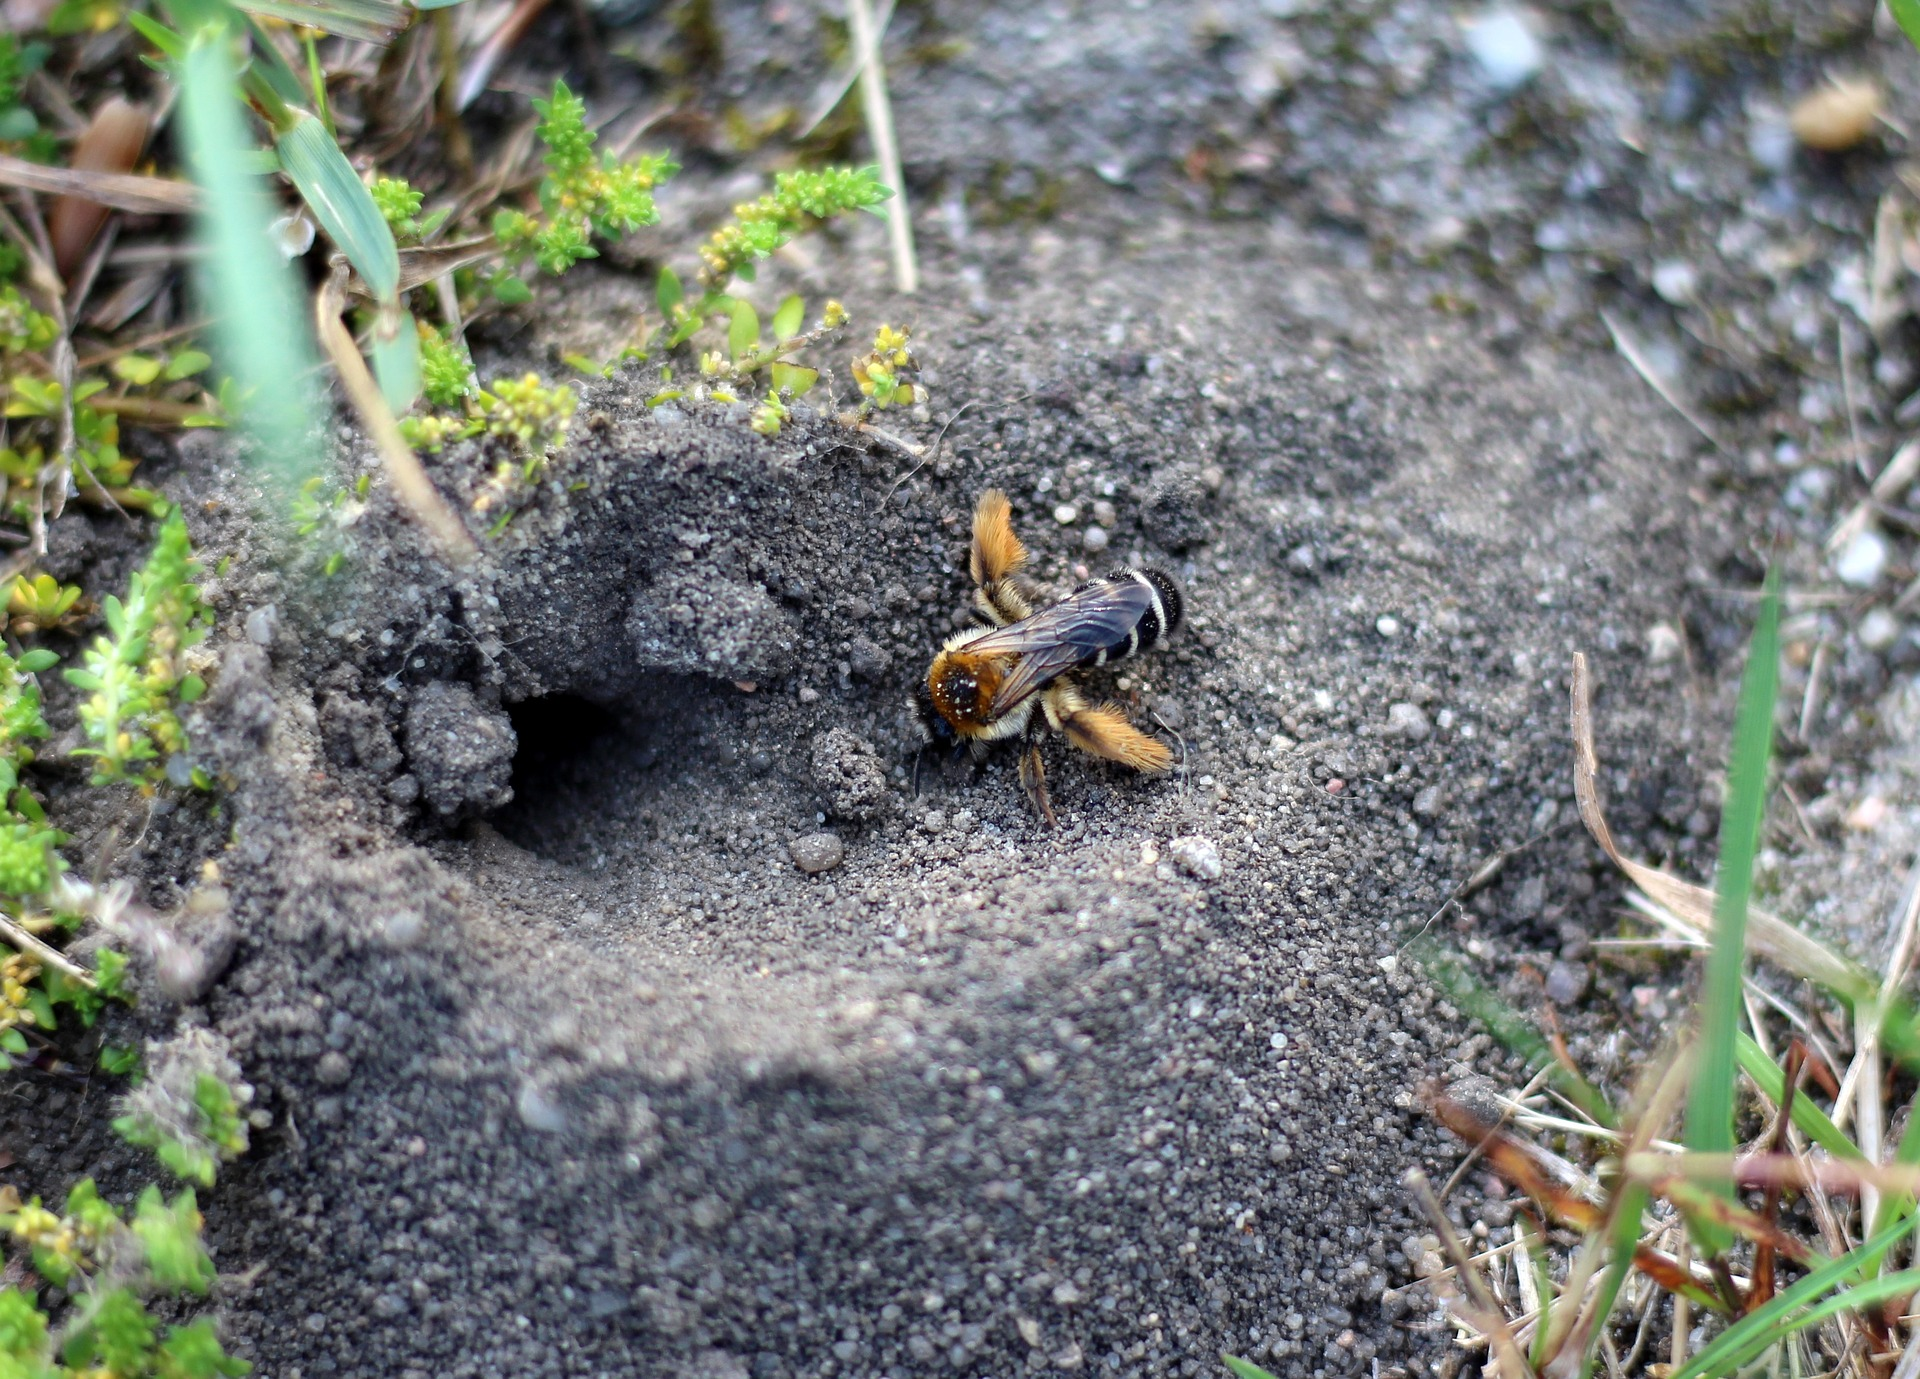 How to Create Nesting Habitat for Native Pollinators